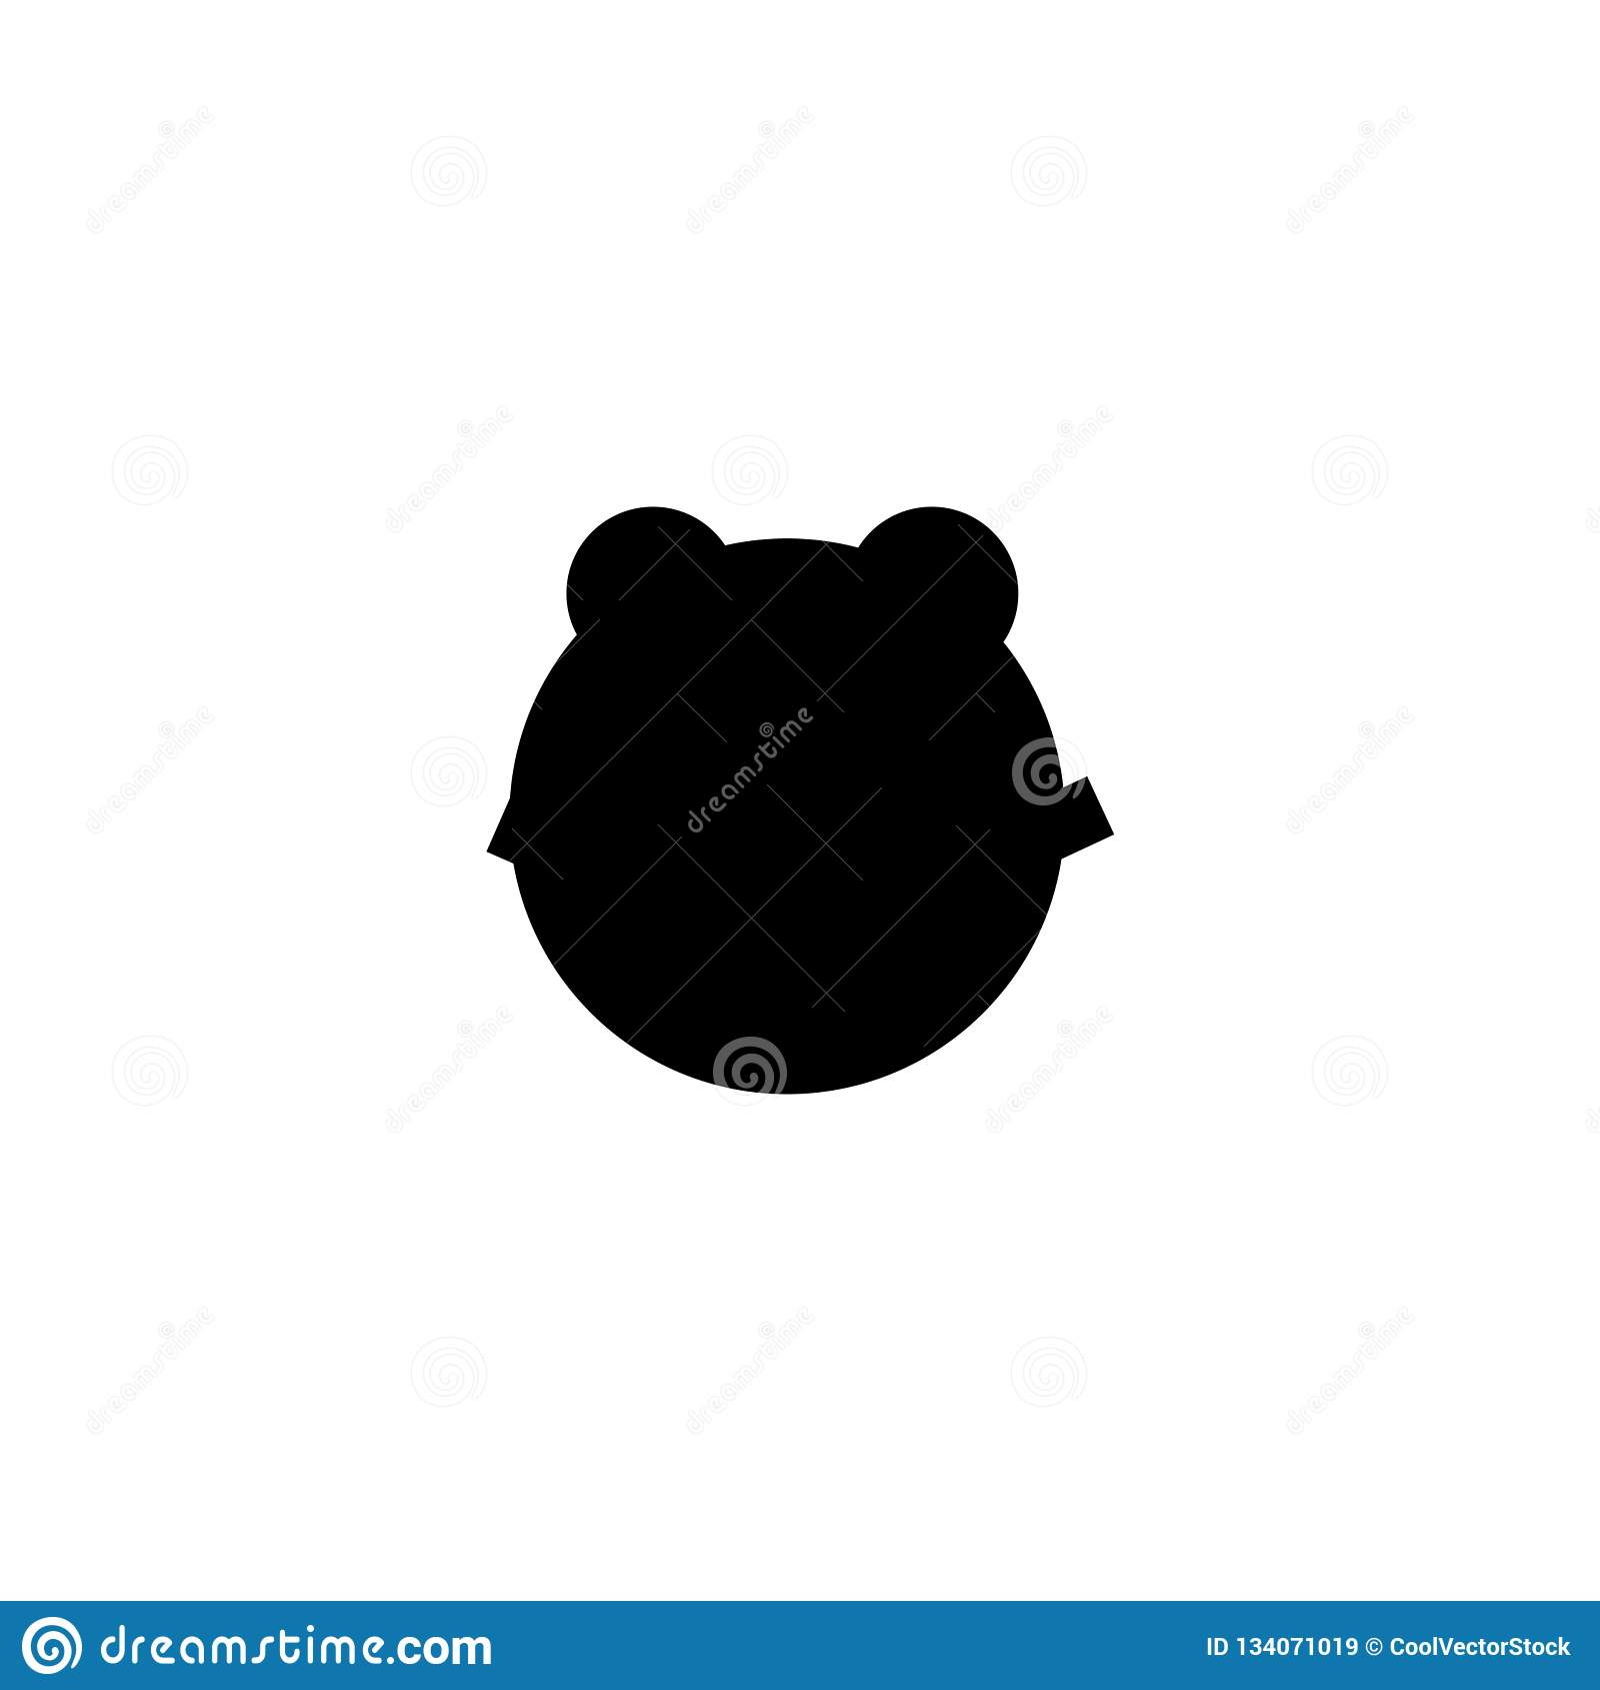 Amphibian icon vector sign and symbol isolated on white background, Amphibian logo concept